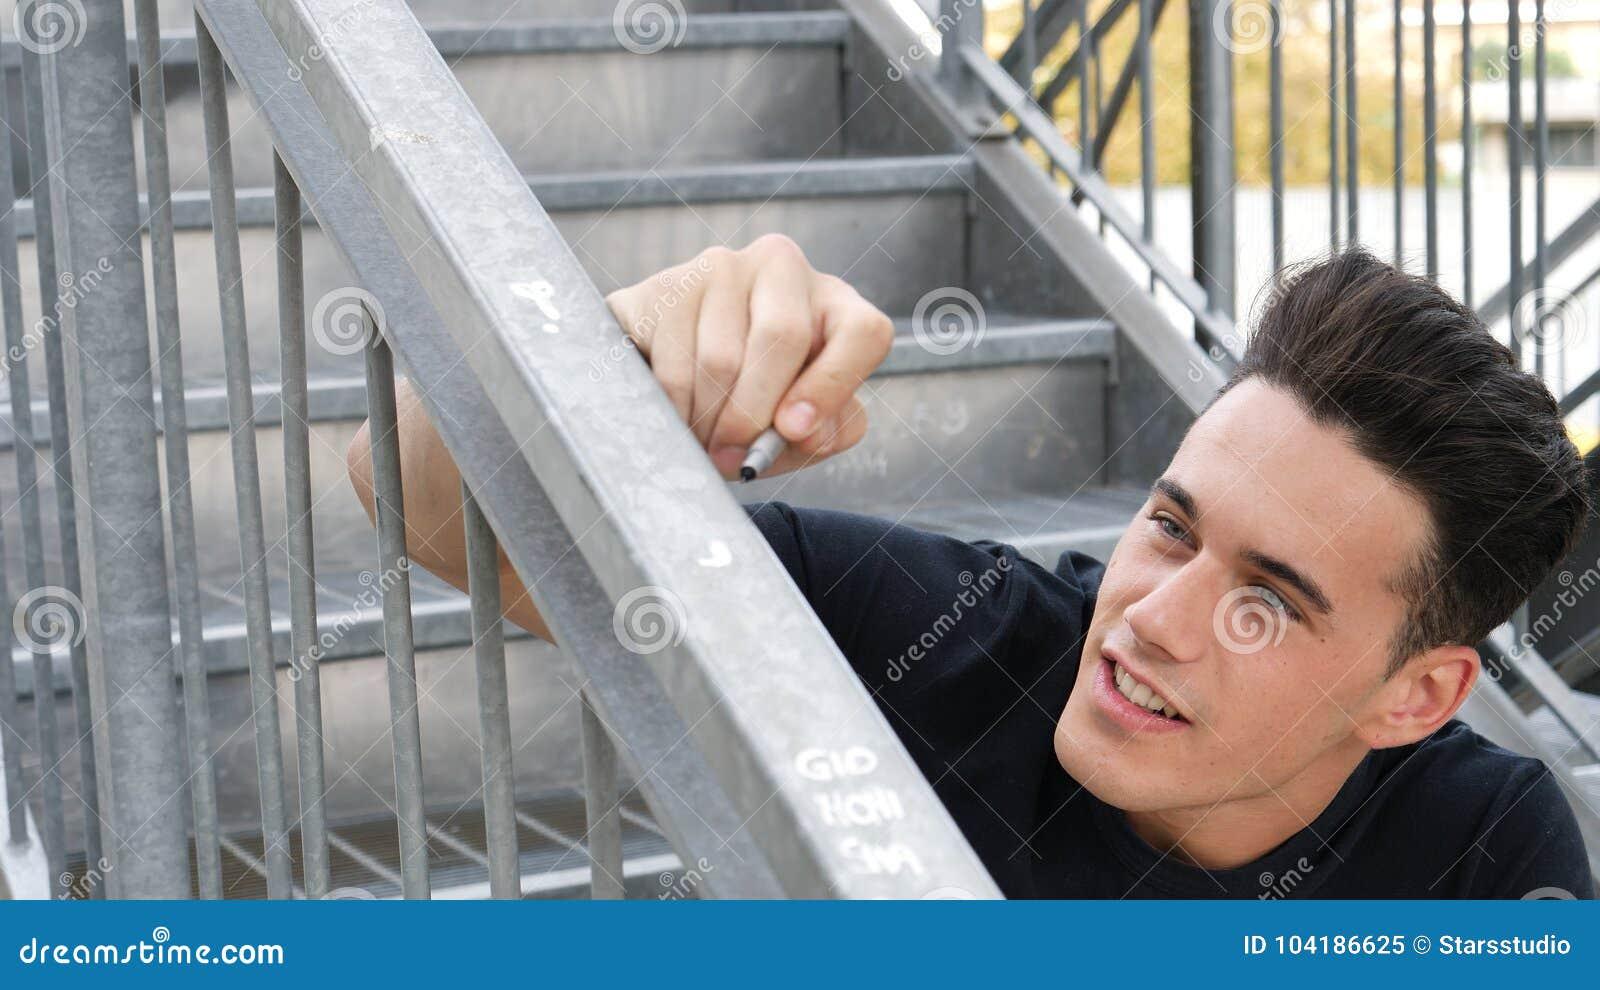 Man writing on banister or handrail